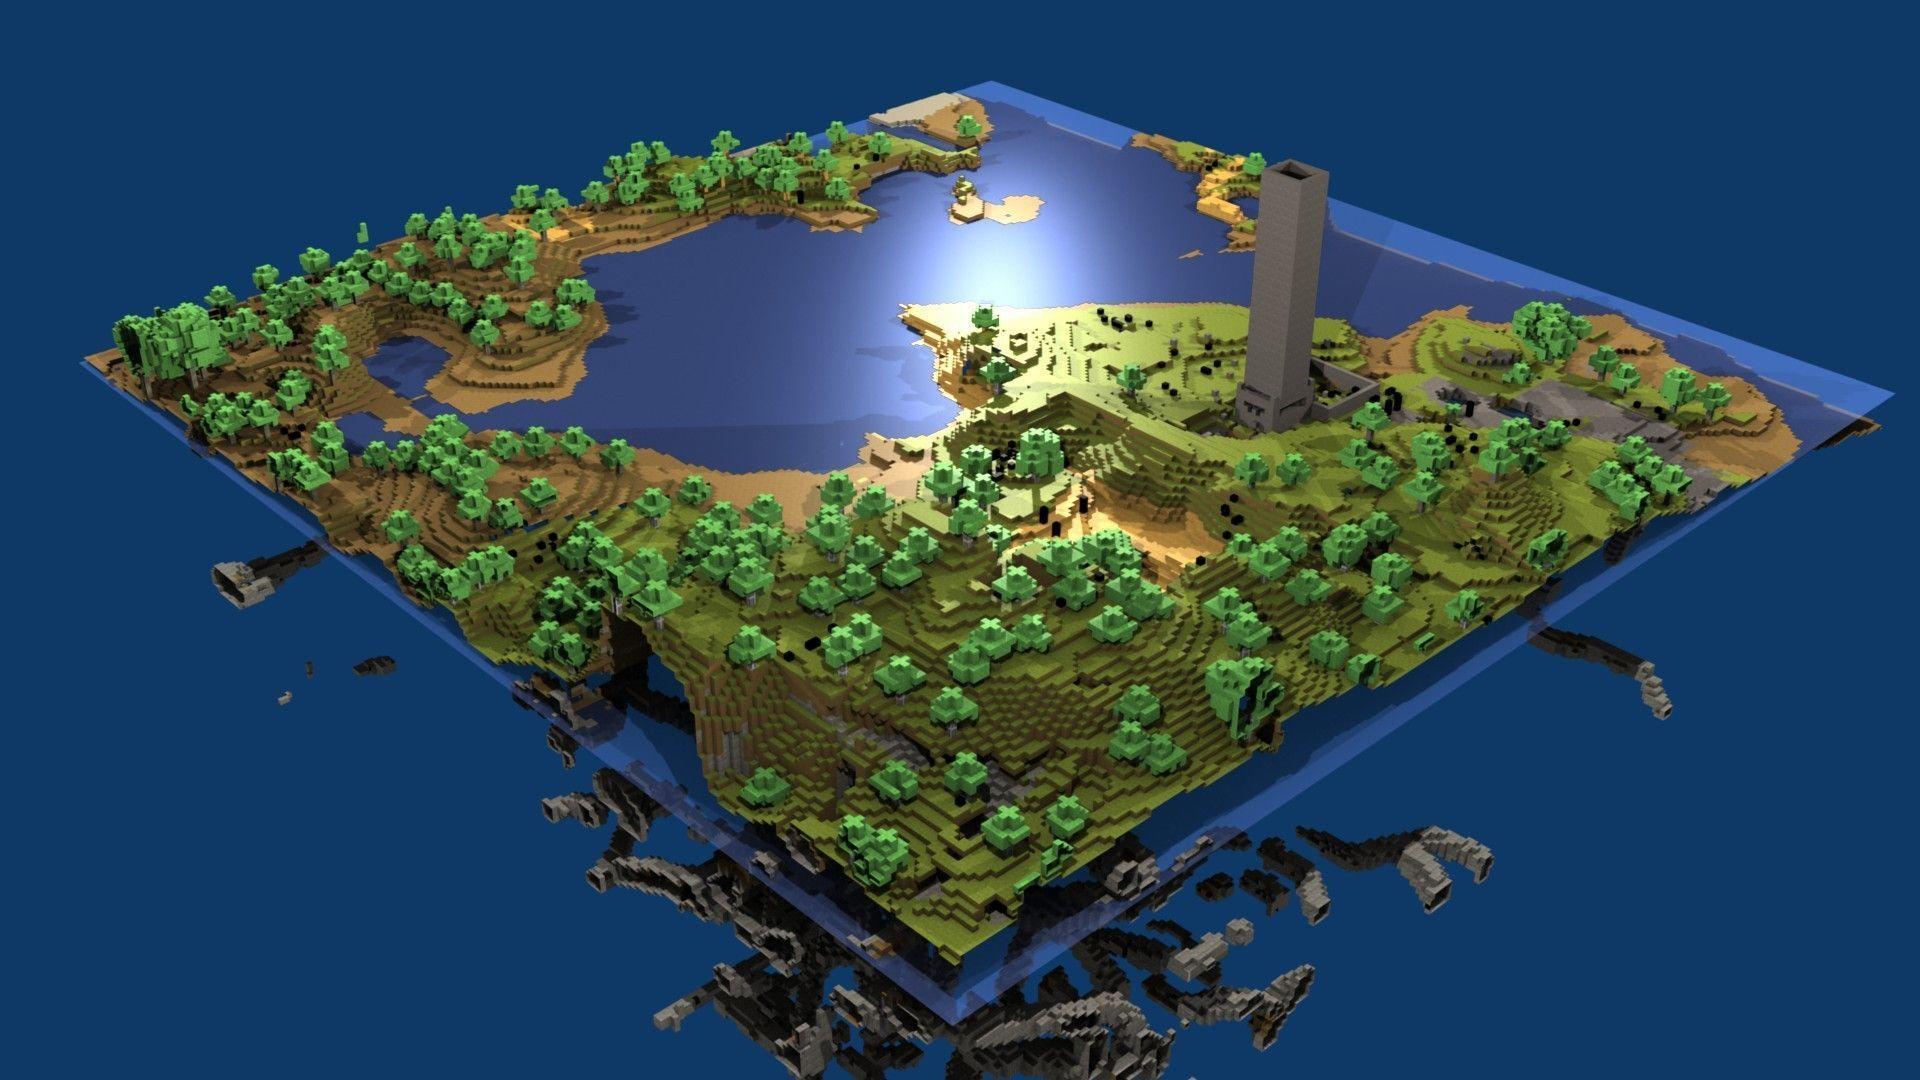 minecraft island wallpaper 1080p - photo #9